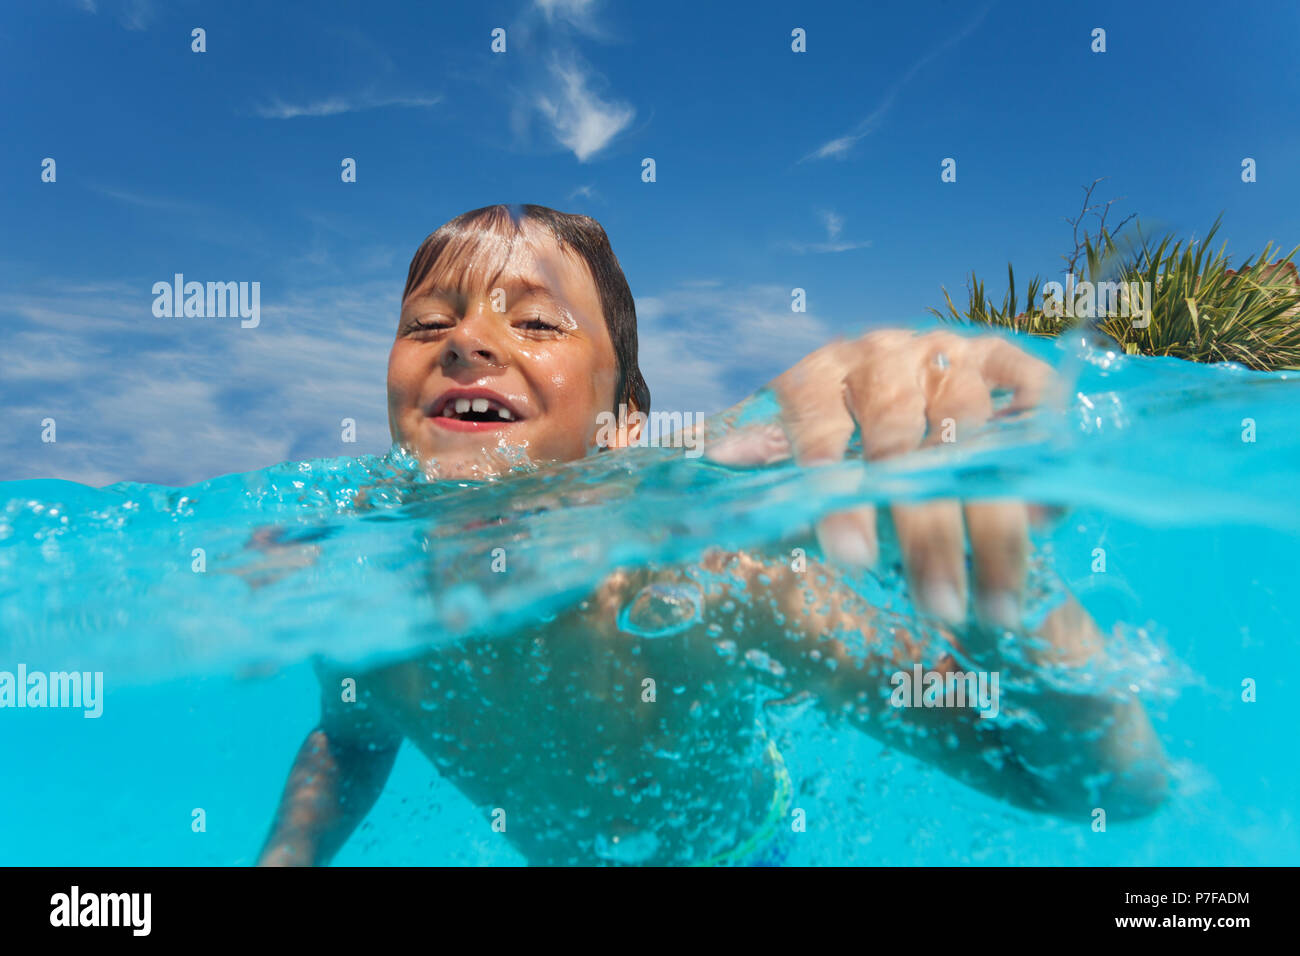 Happy preteen boy swimming in outdoor pool - Stock Image